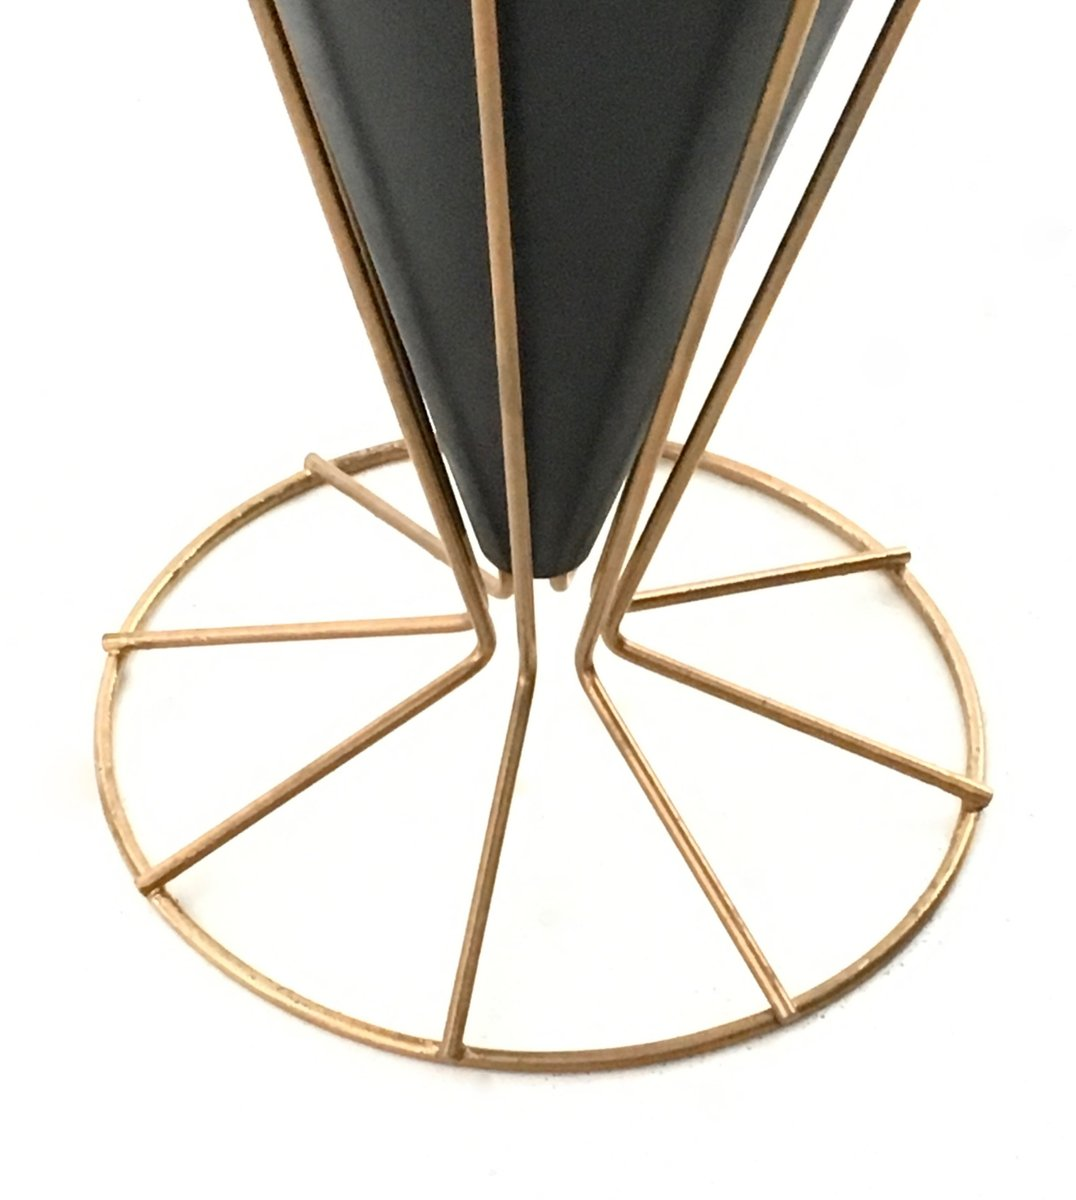 Umbrella Stand Argos Ireland: Minimalist Italian Umbrella Stand, 1950s For Sale At Pamono